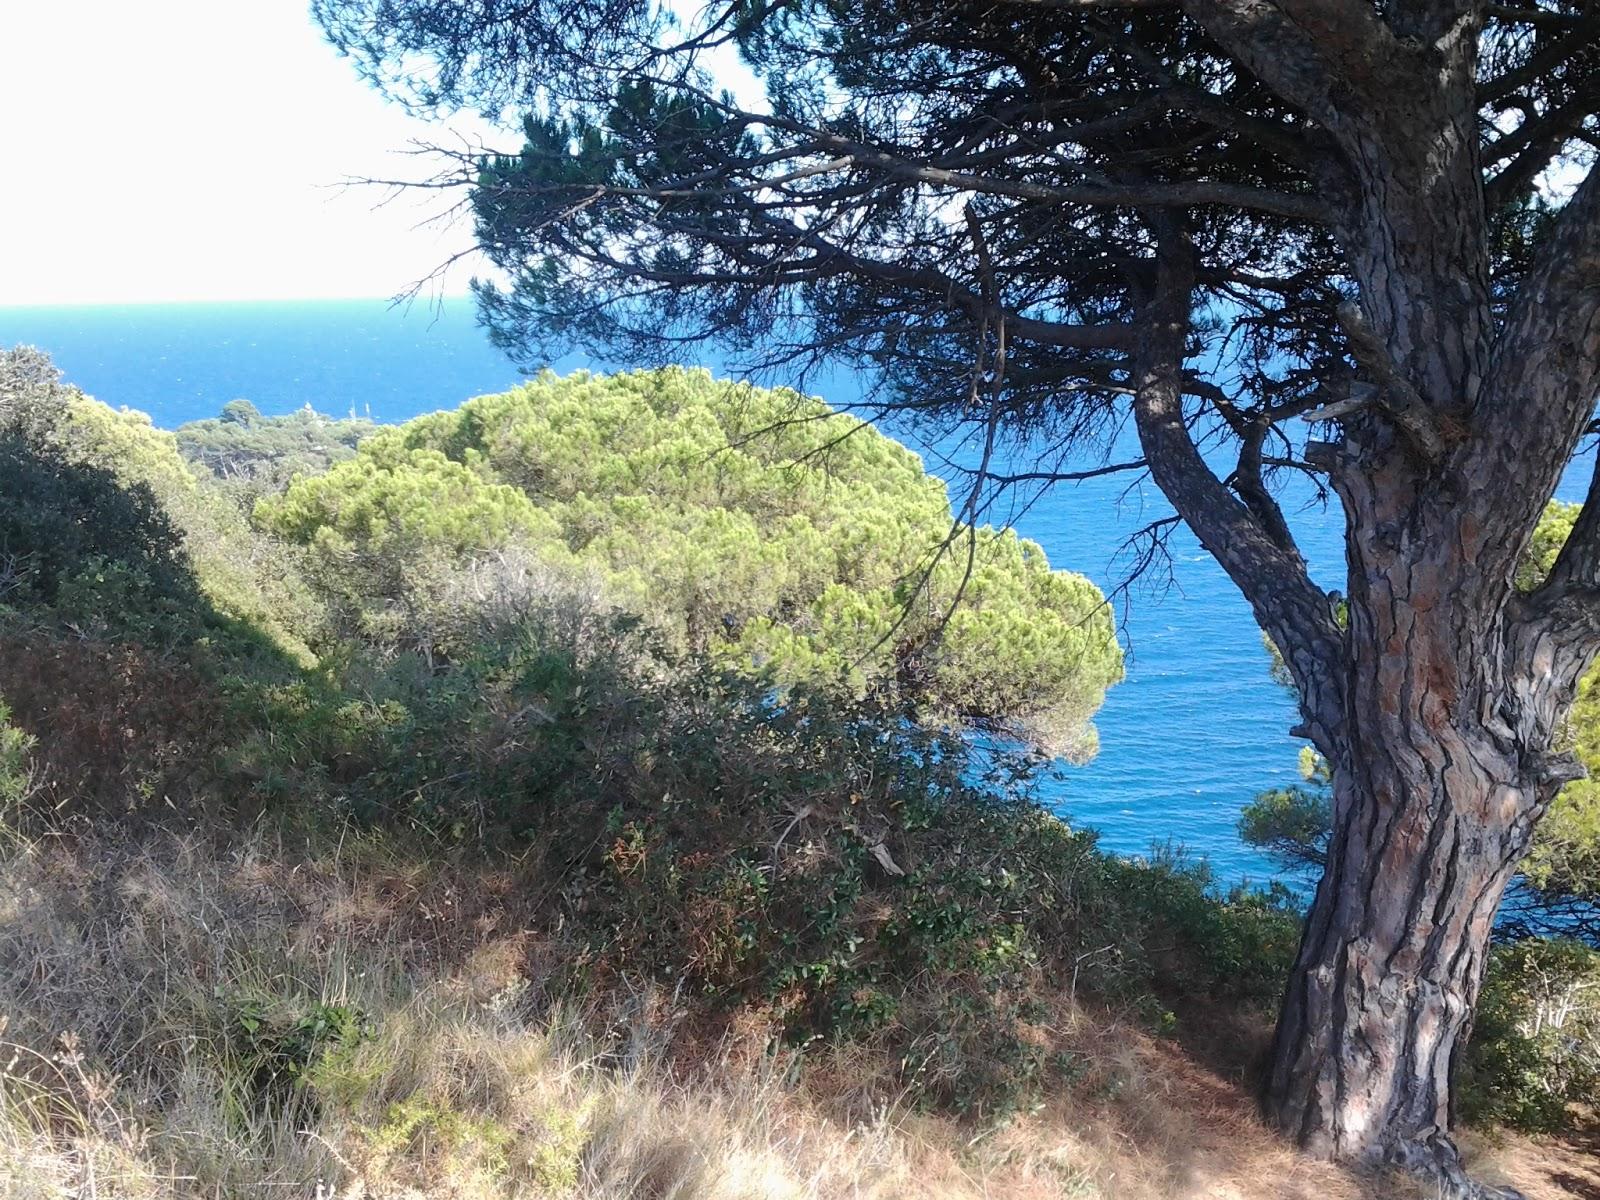 Camí de Ronda Tossa de Mar